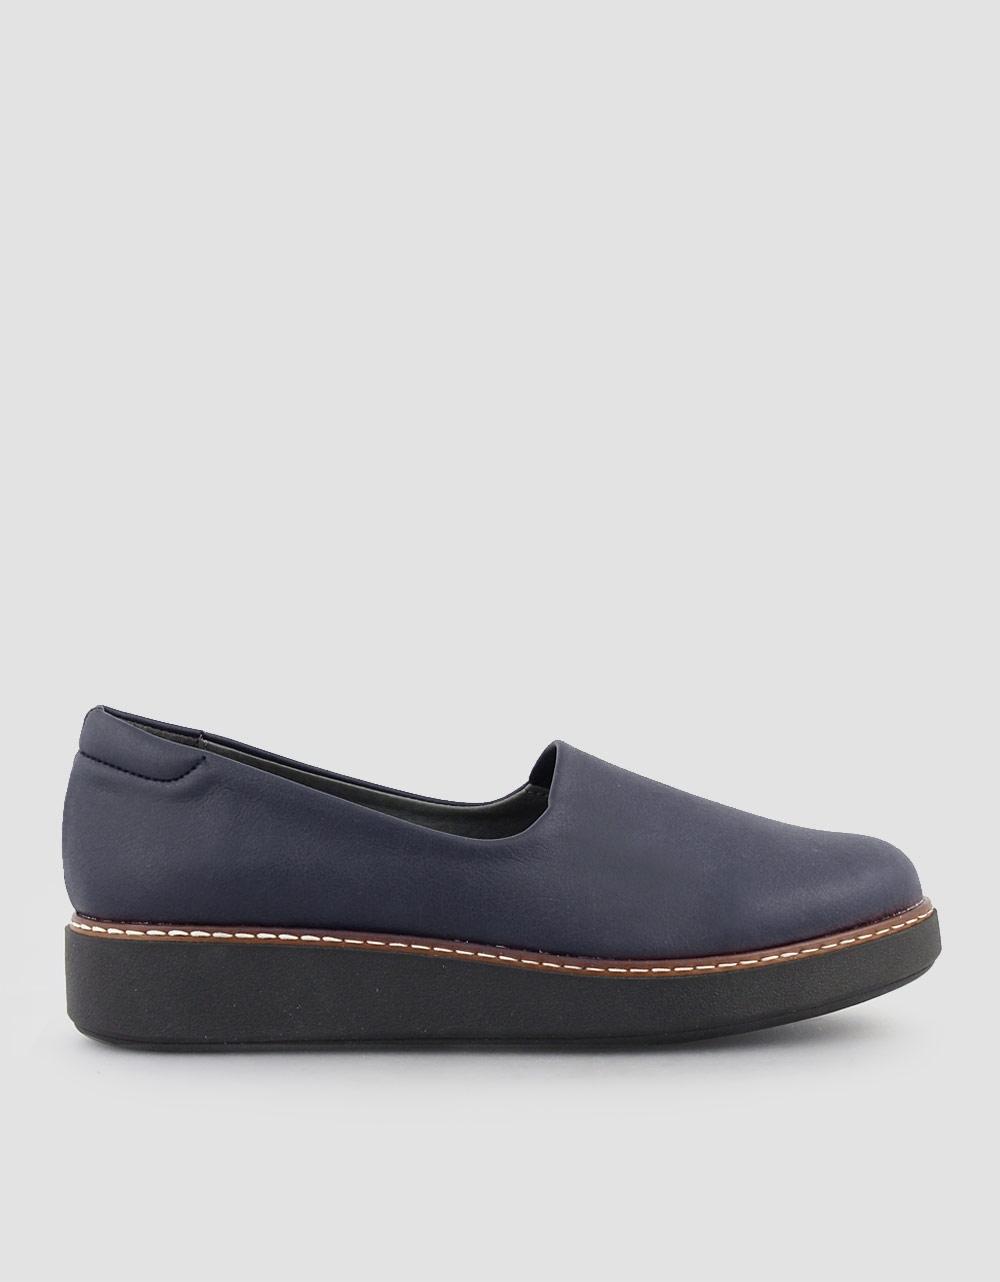 ba8dc1cb308 Γυναικεία loafers σε απλή γραμμή Μπλε